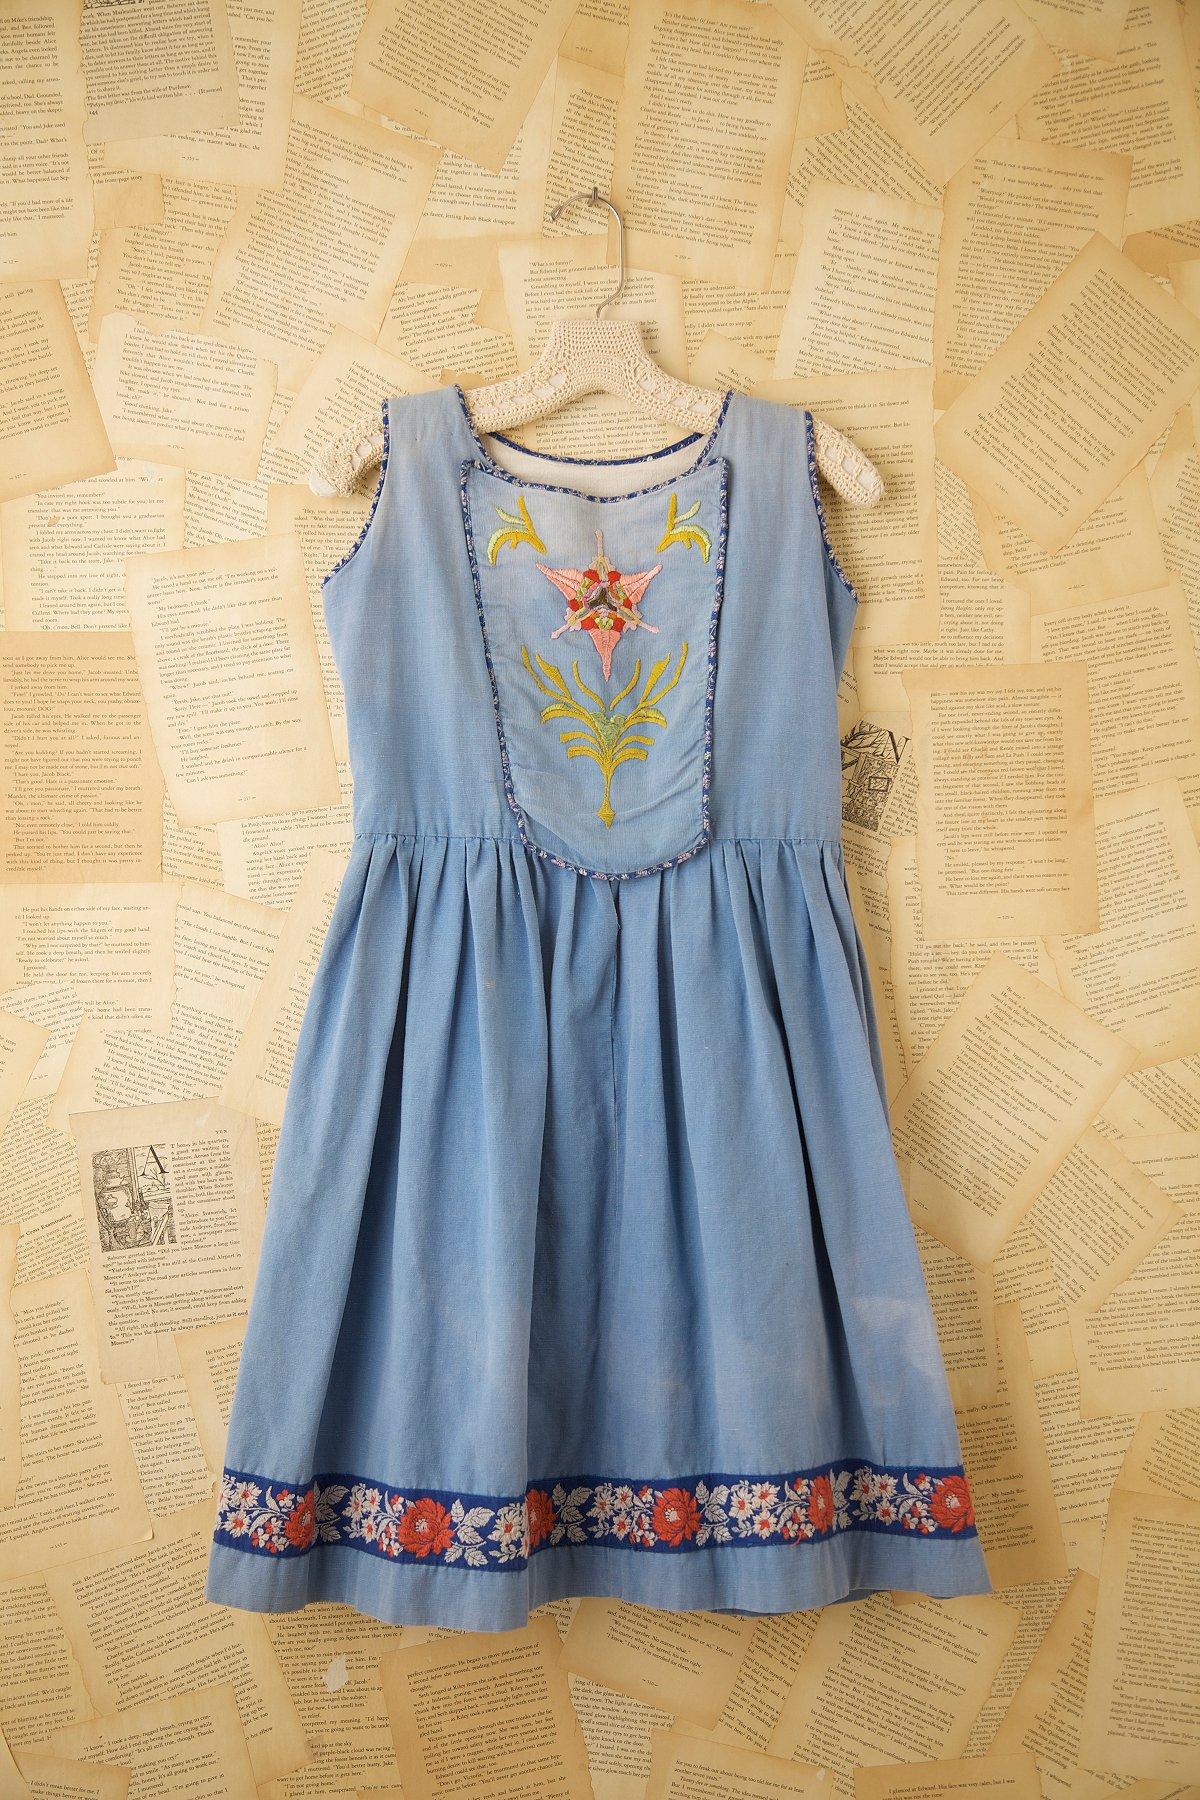 Vintage Embroidered Bib Dress